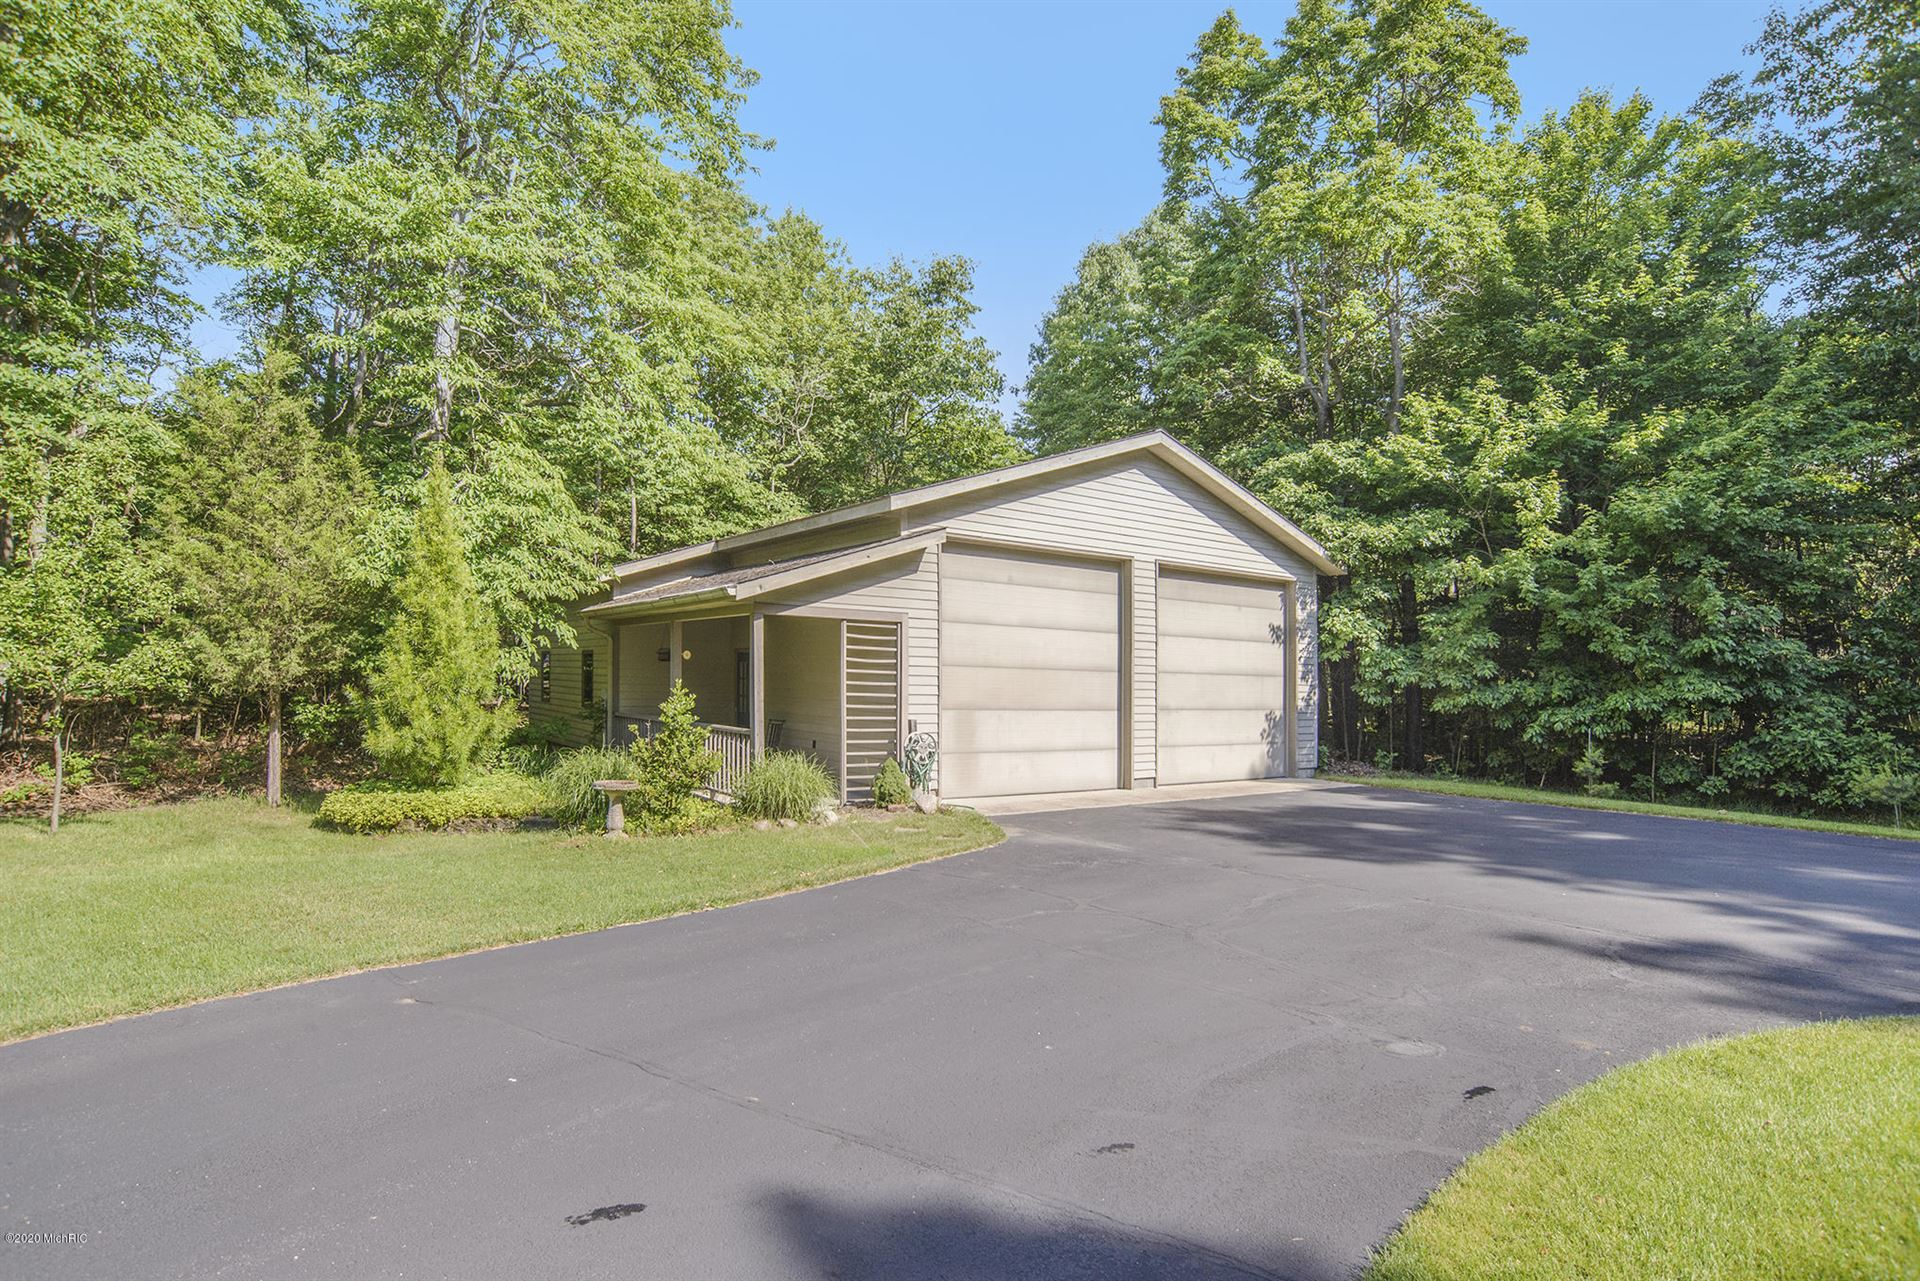 Photo of 6538 Creekwood Drive, Holland, MI 49423 (MLS # 20007395)